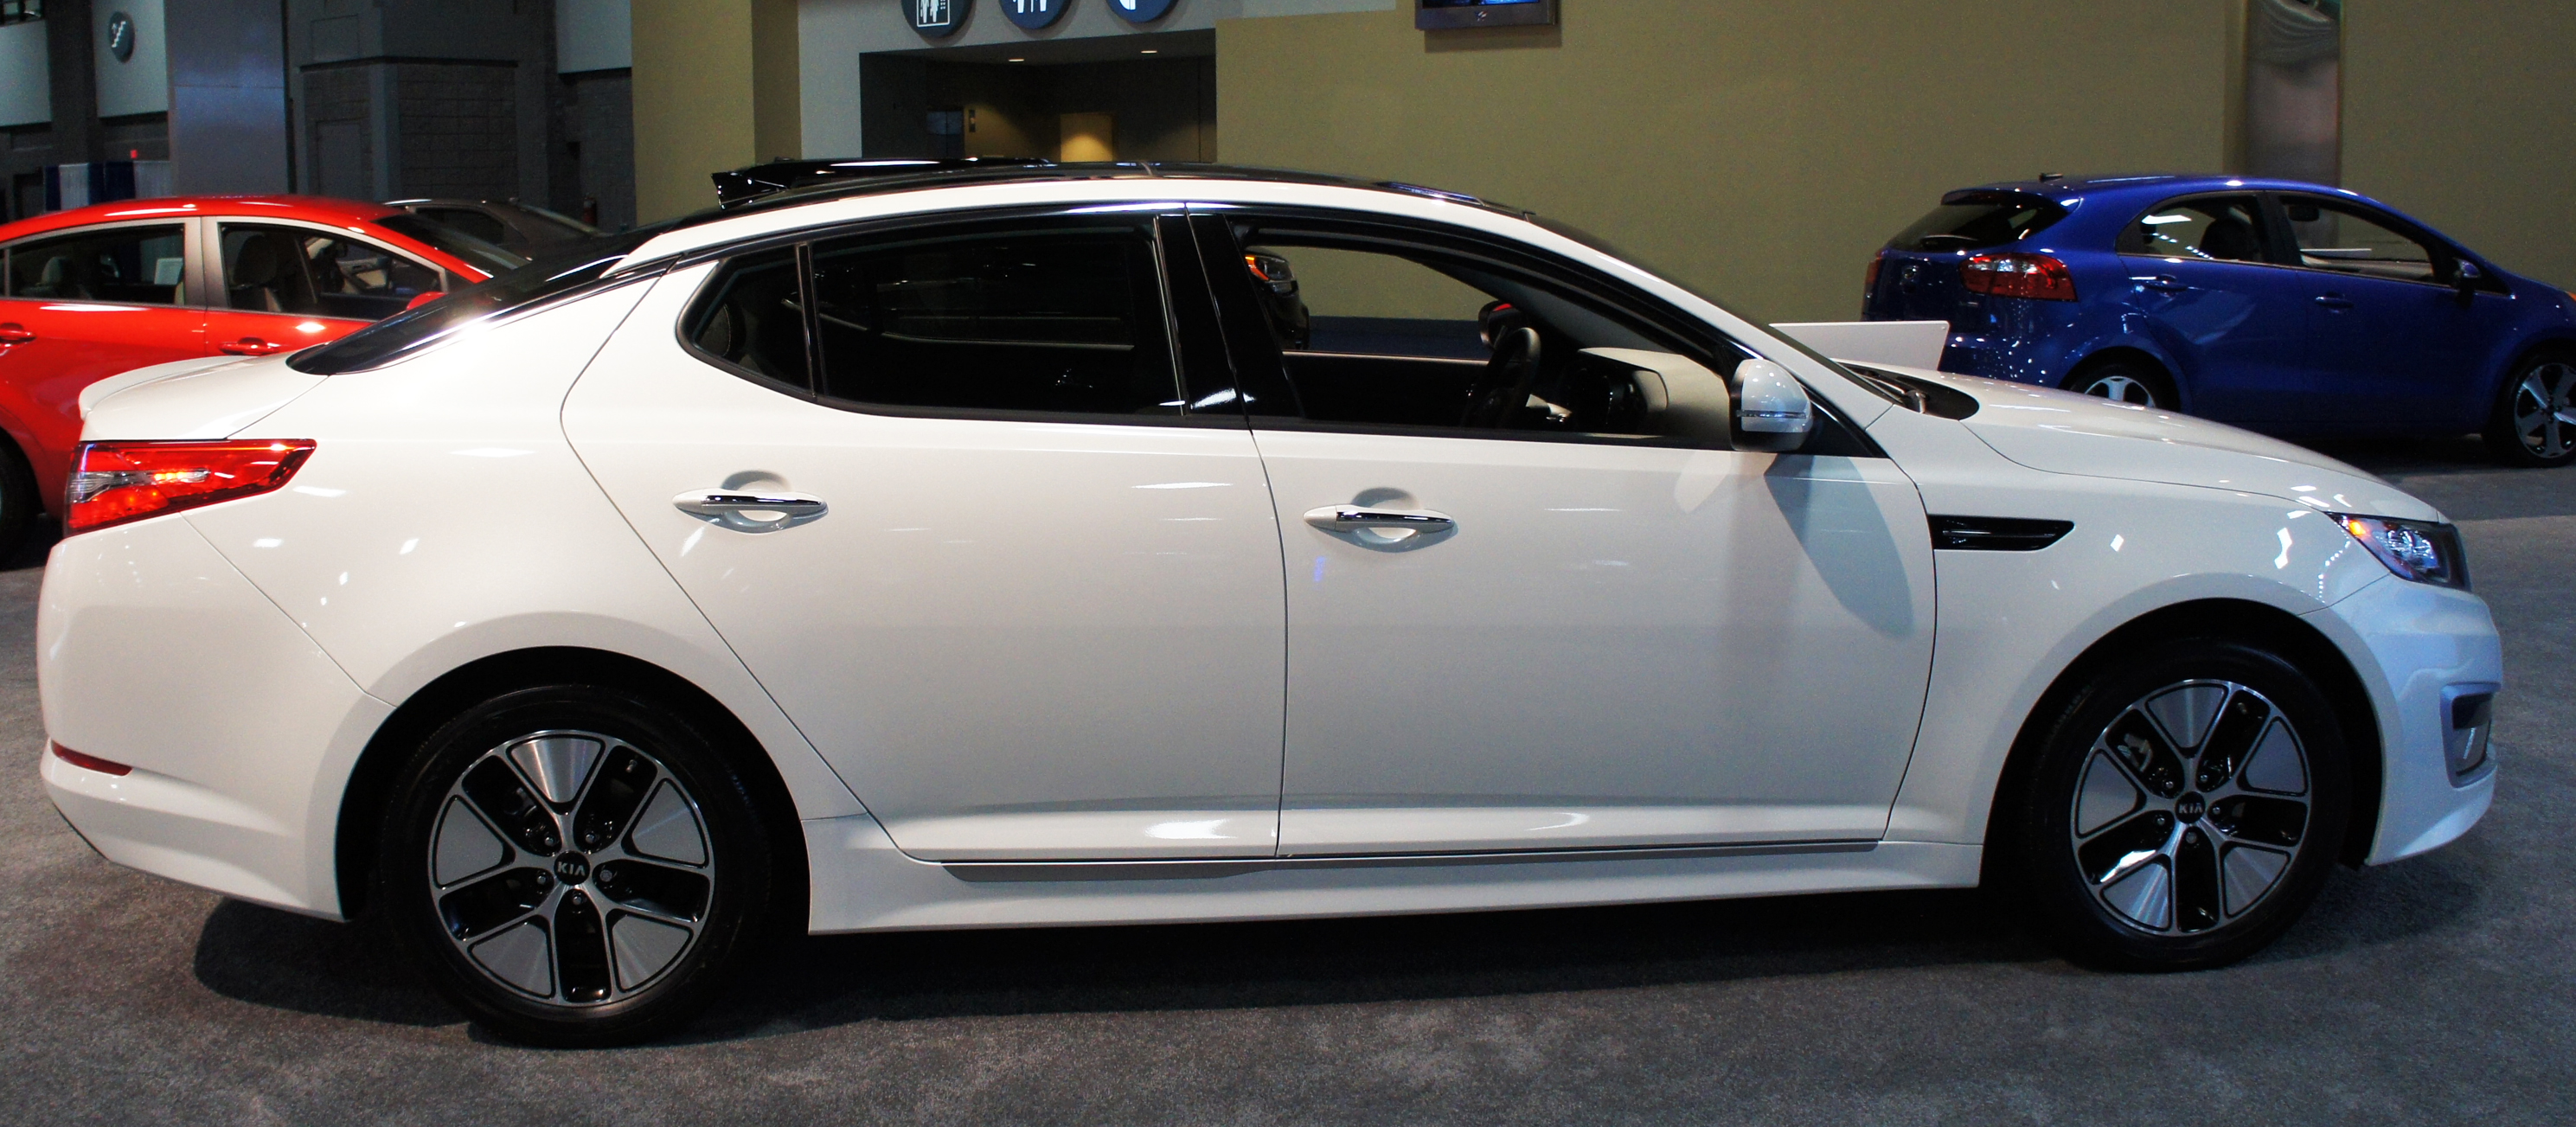 File:2012 Kia Optima Hybrid WAS 2012 0738.JPG